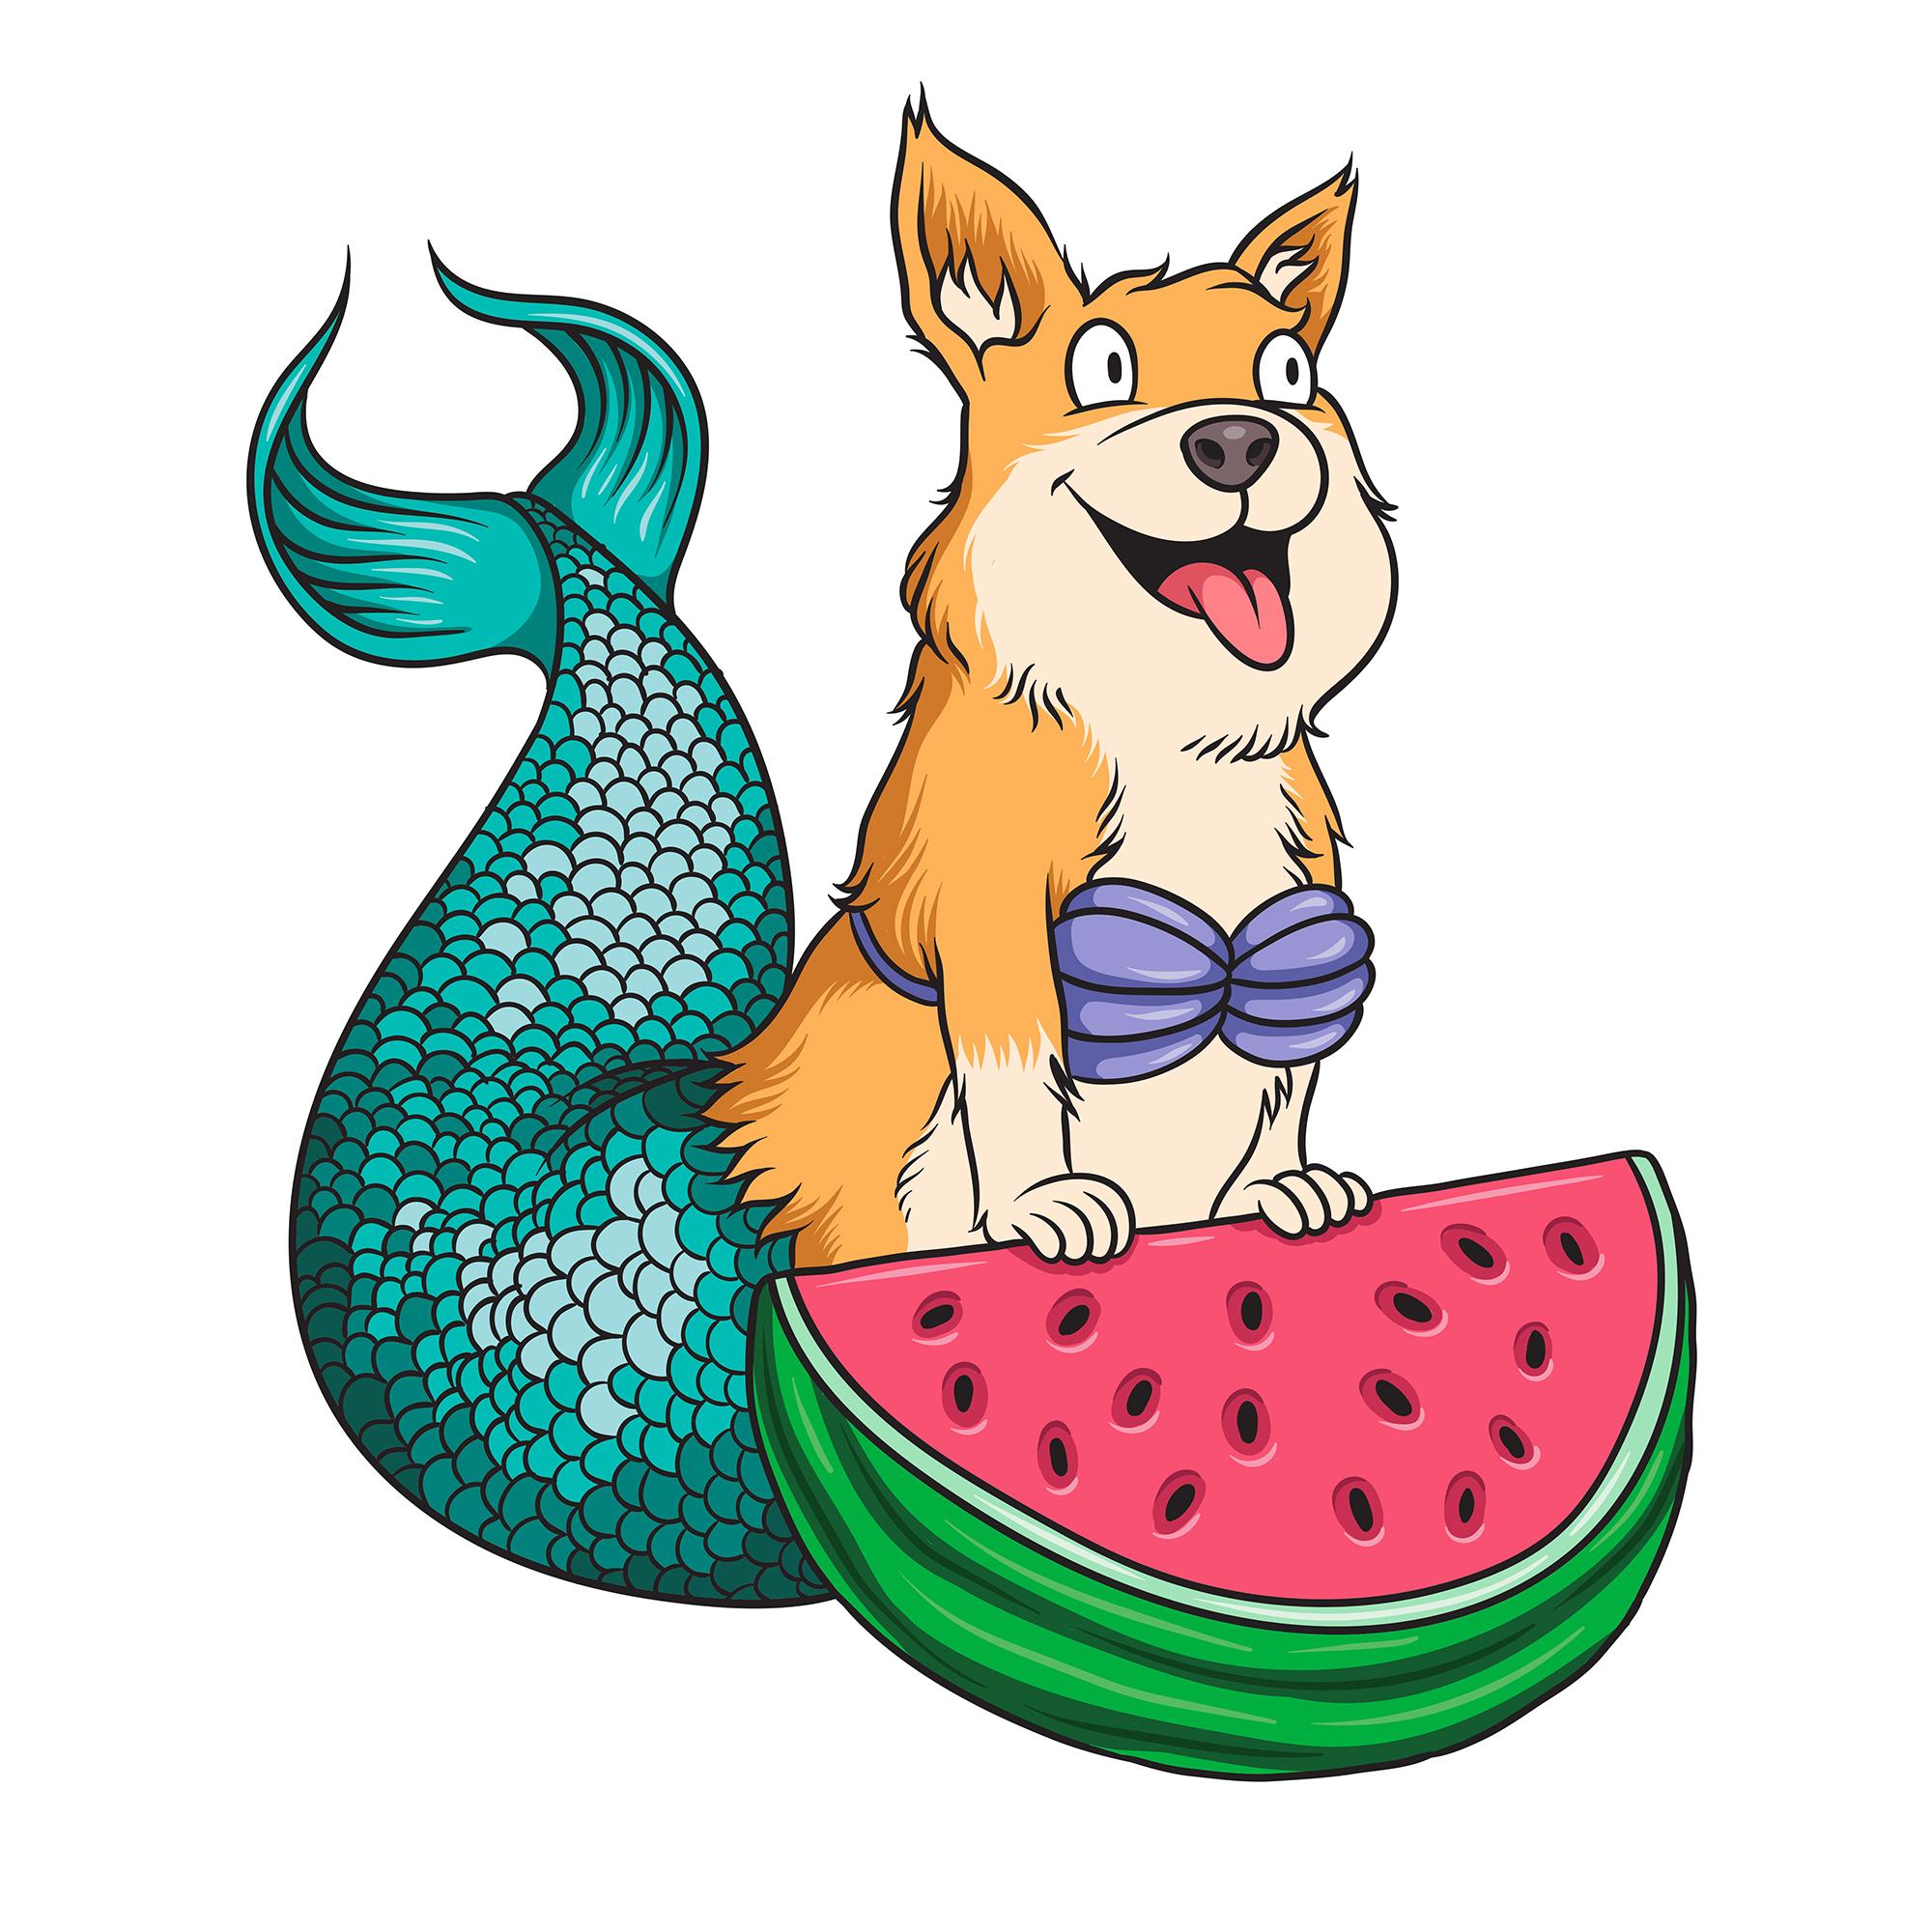 20161209-JustWorks-WatermelonDogfish-colors.jpg